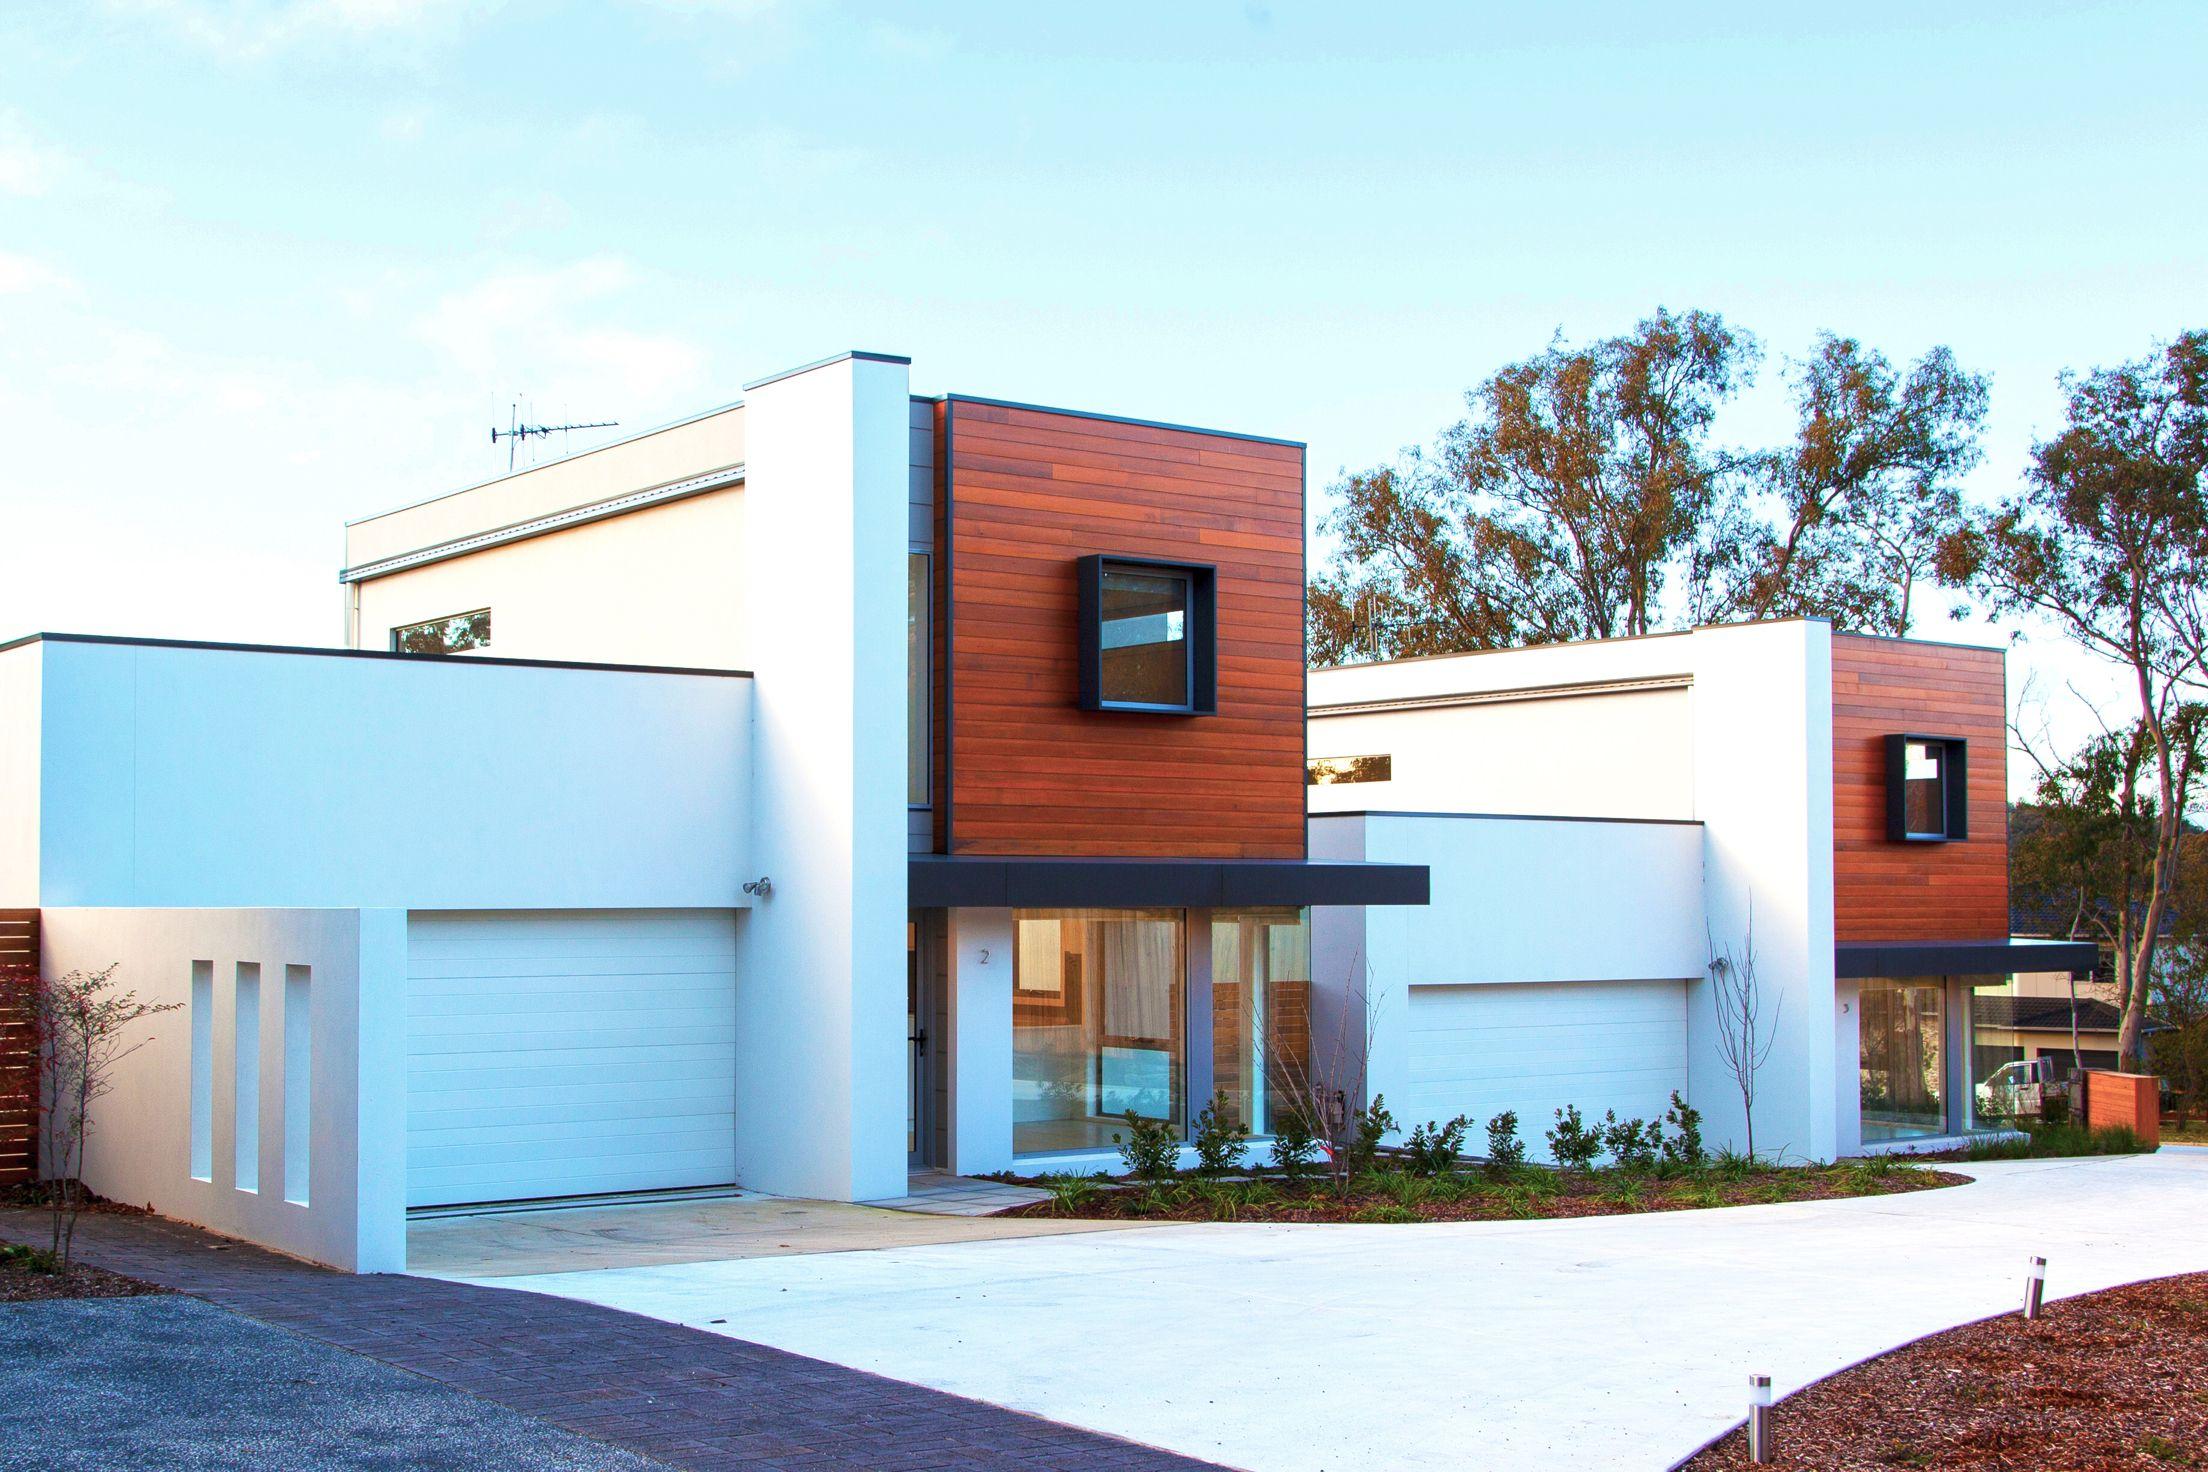 aranda unit project national award winner with images on benjamin moore house paint simulator id=67873